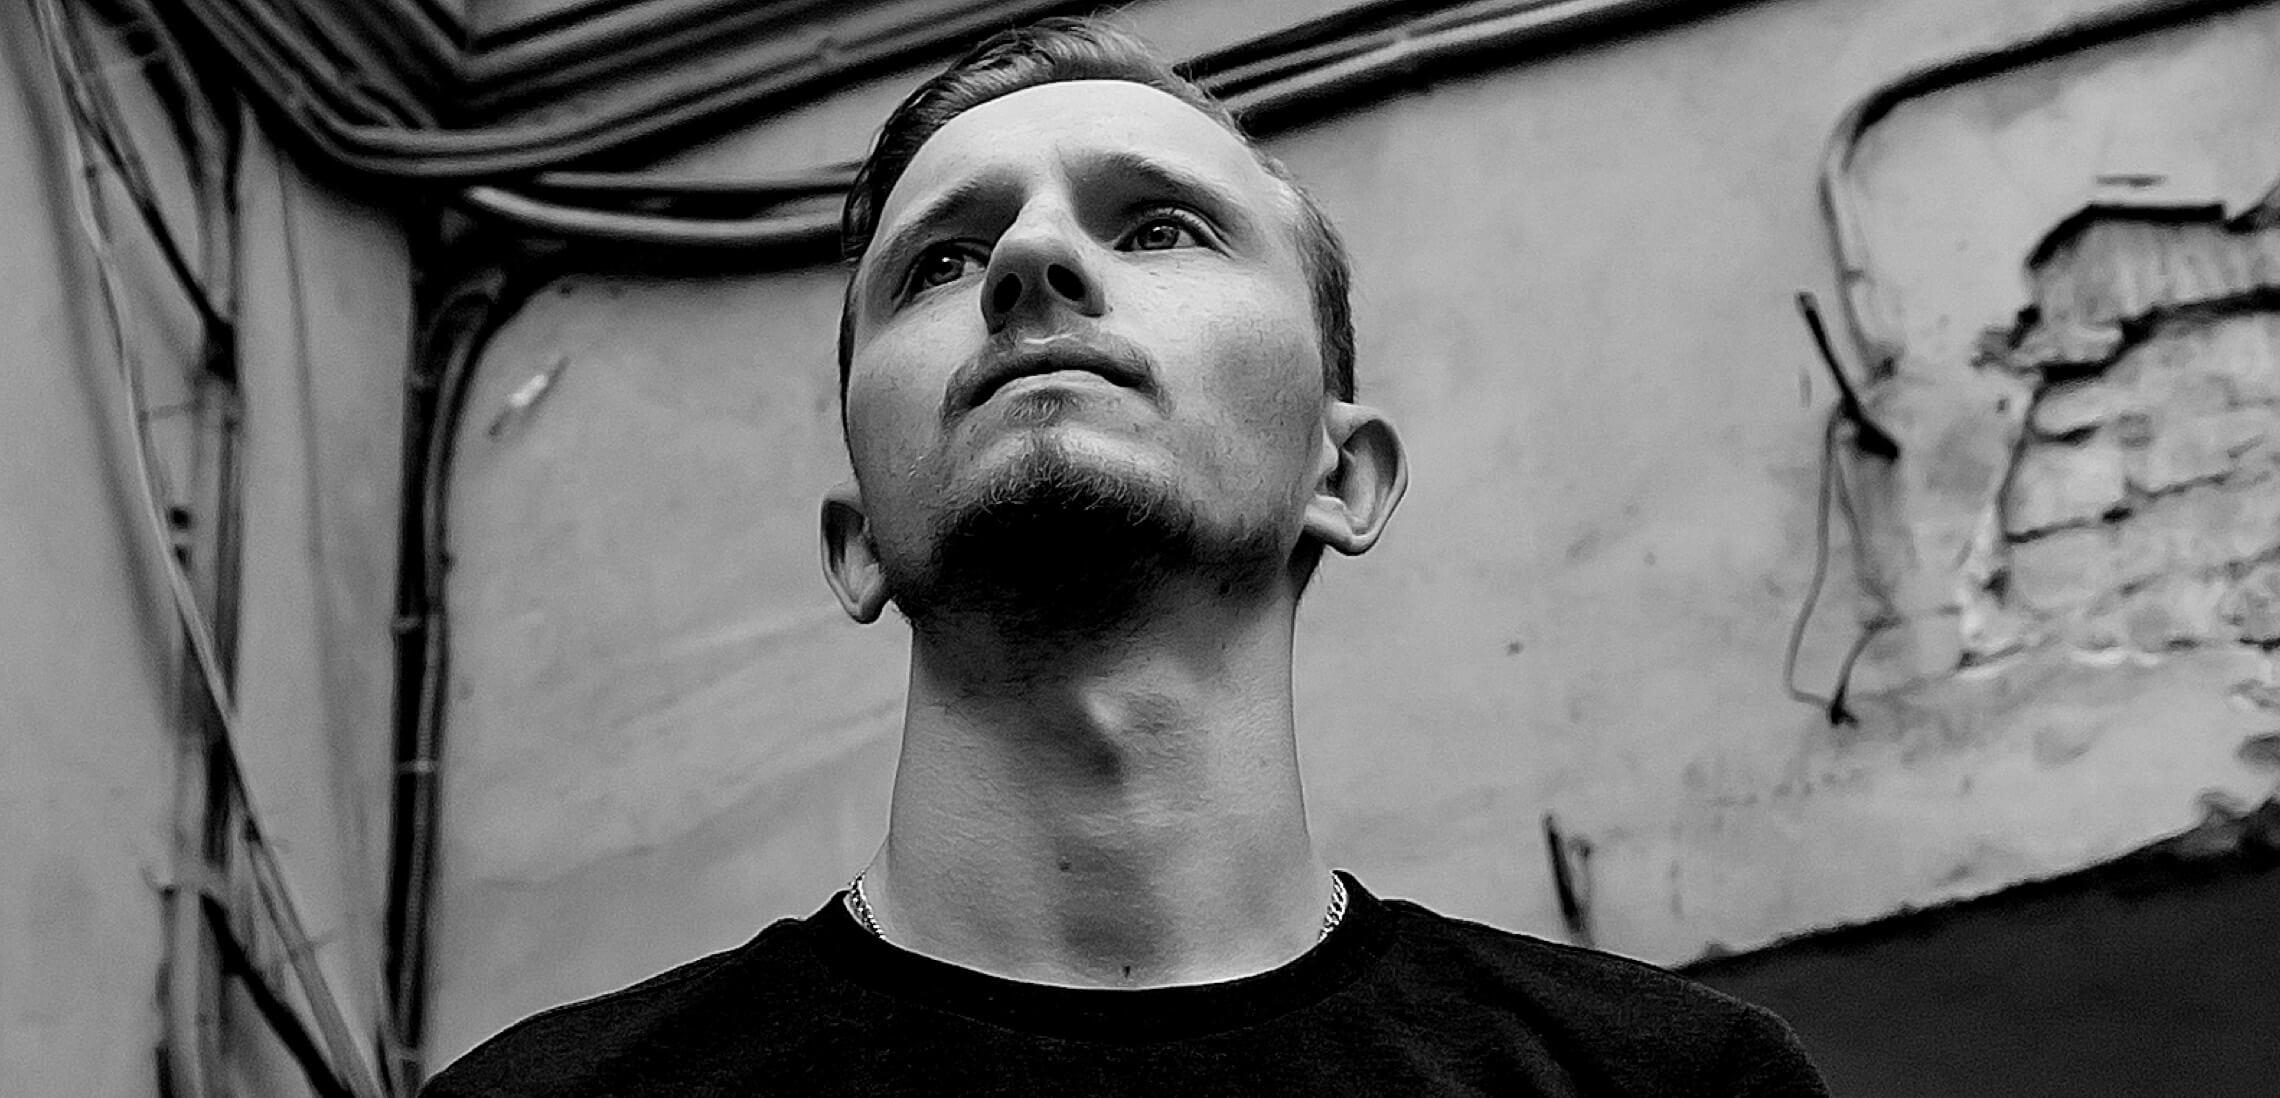 Arkady Antsyrev - Fill It EP hero